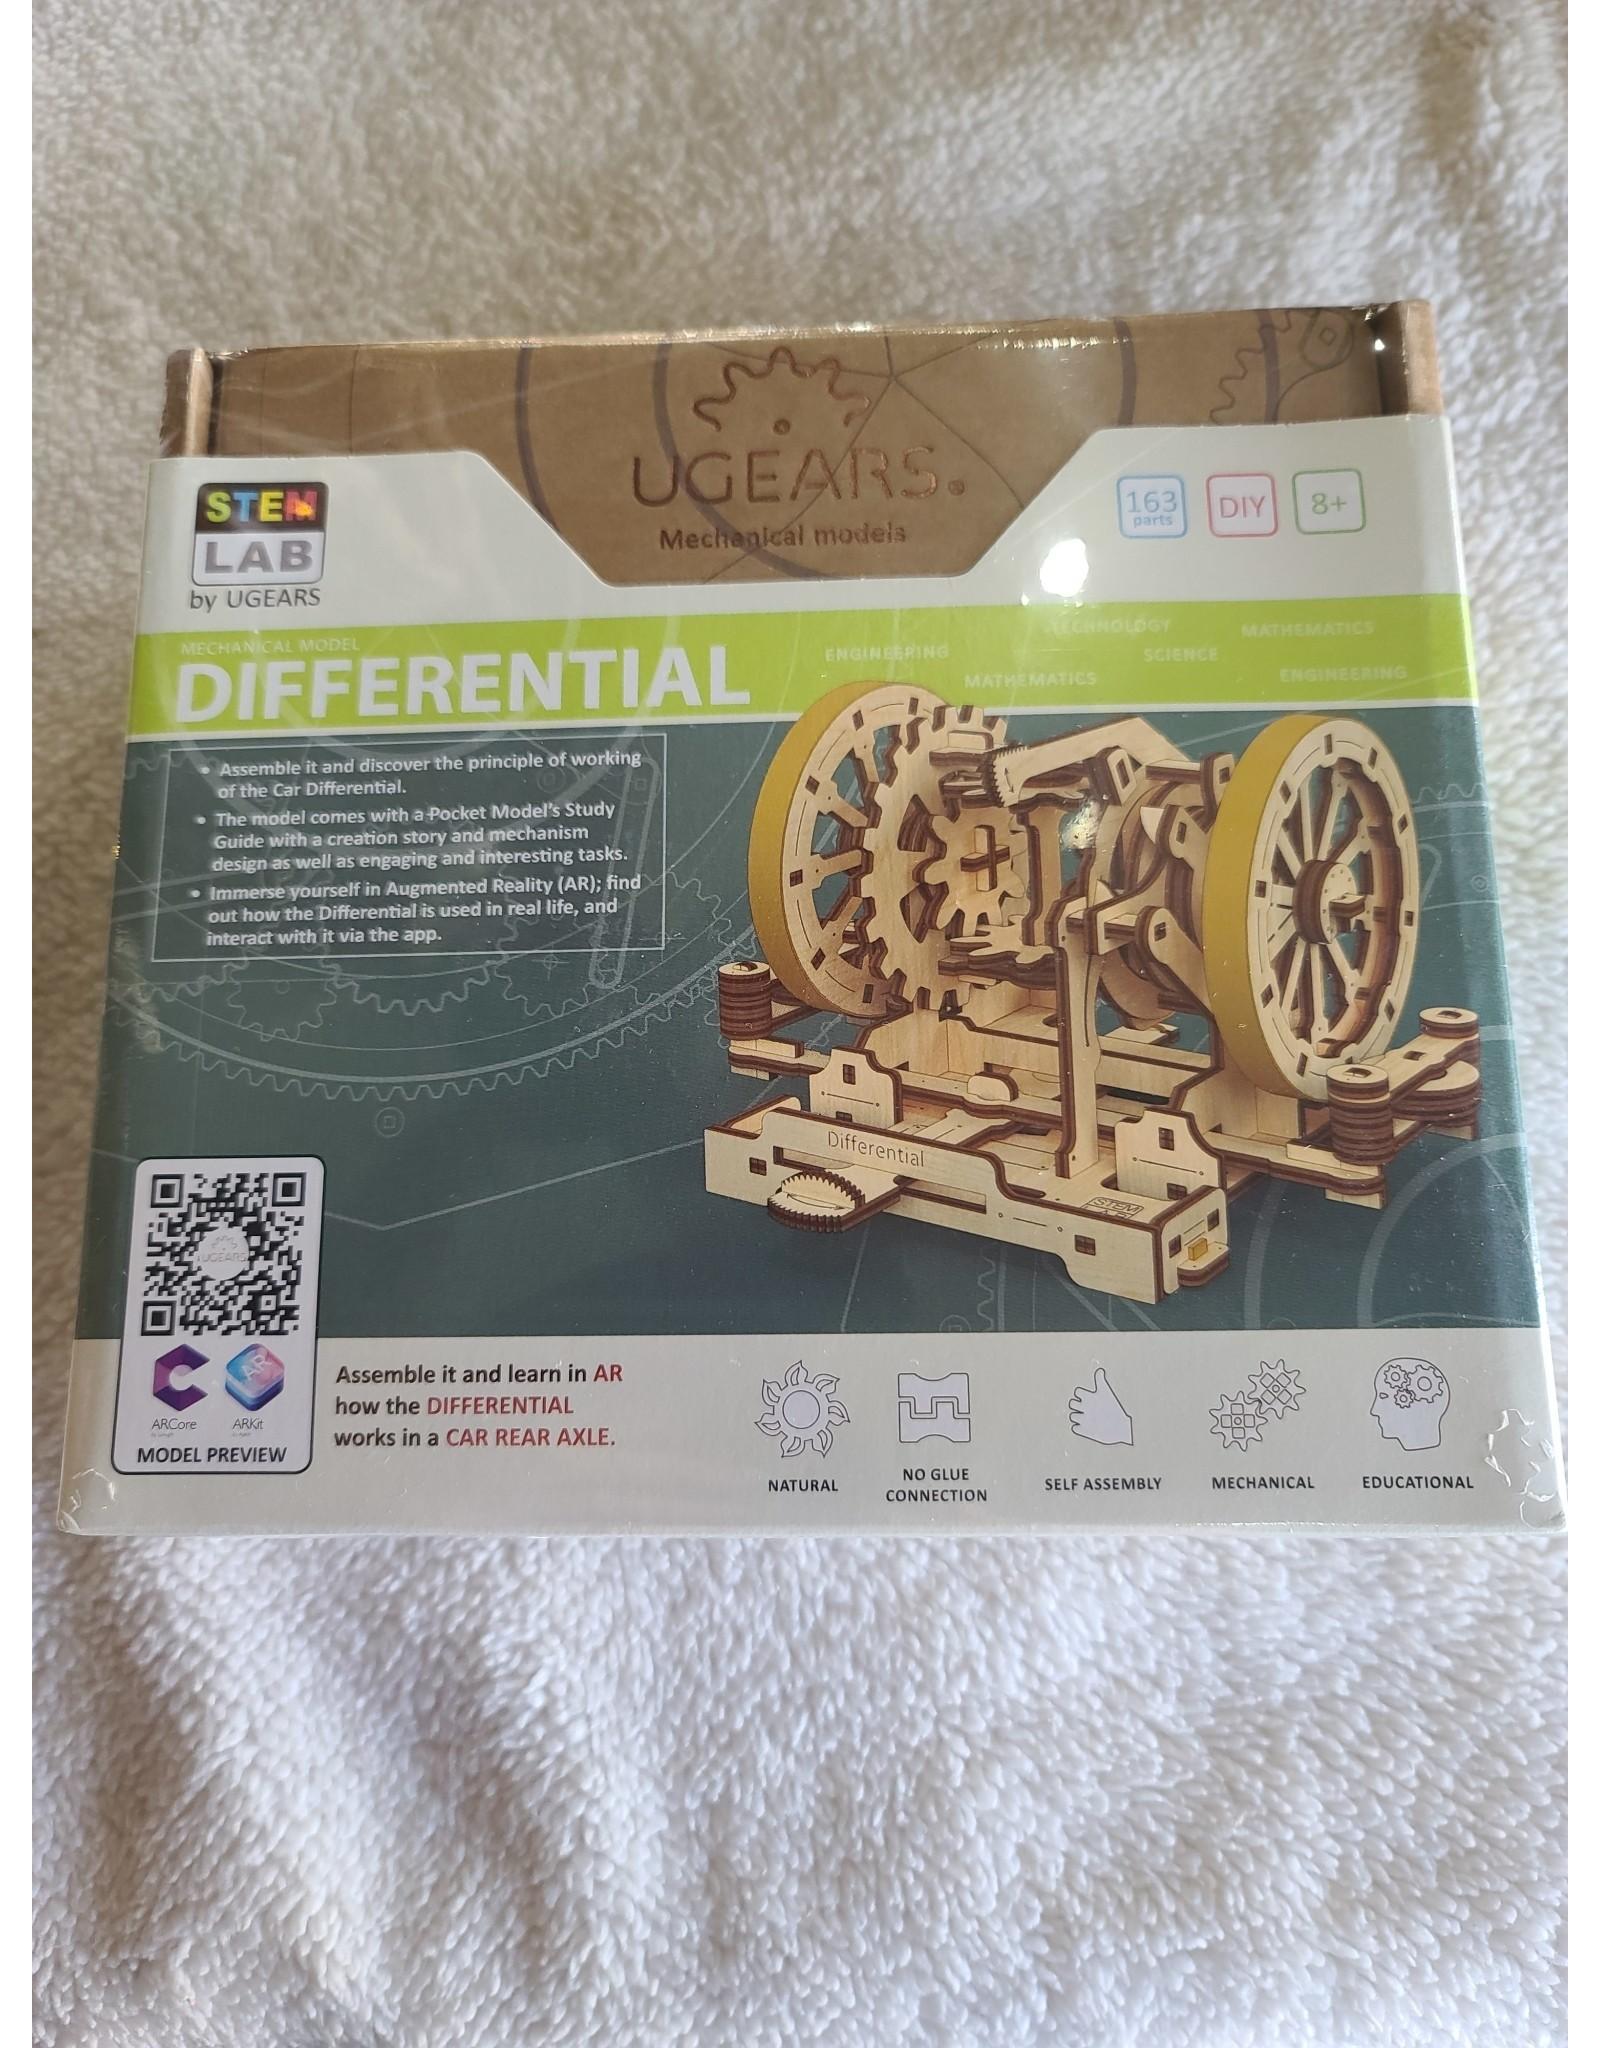 3D Wooden Model | STEM Lab Differential